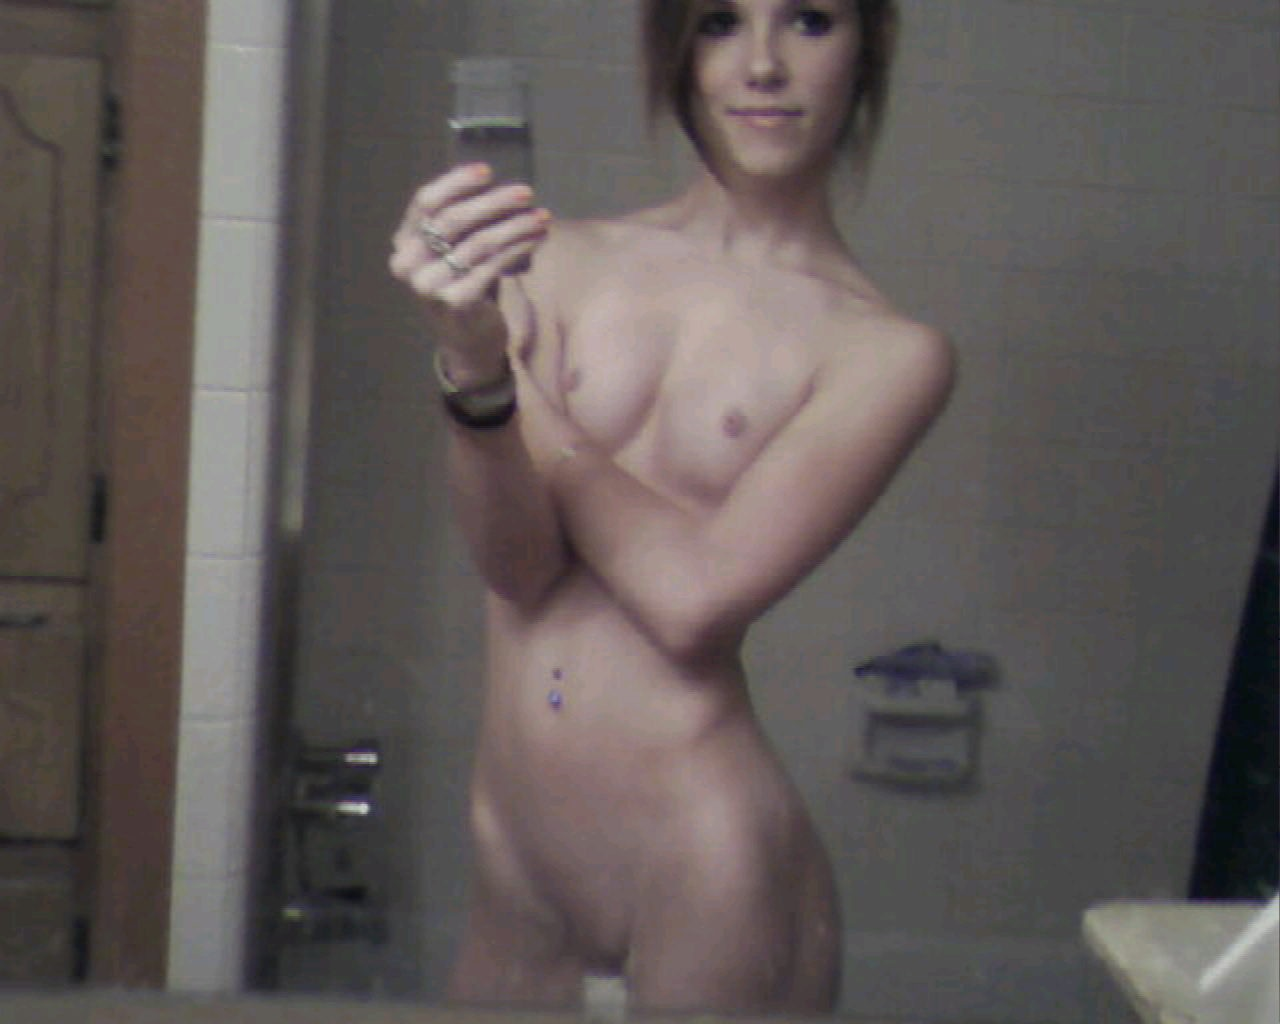 male celeb fake porn ashton kutcher